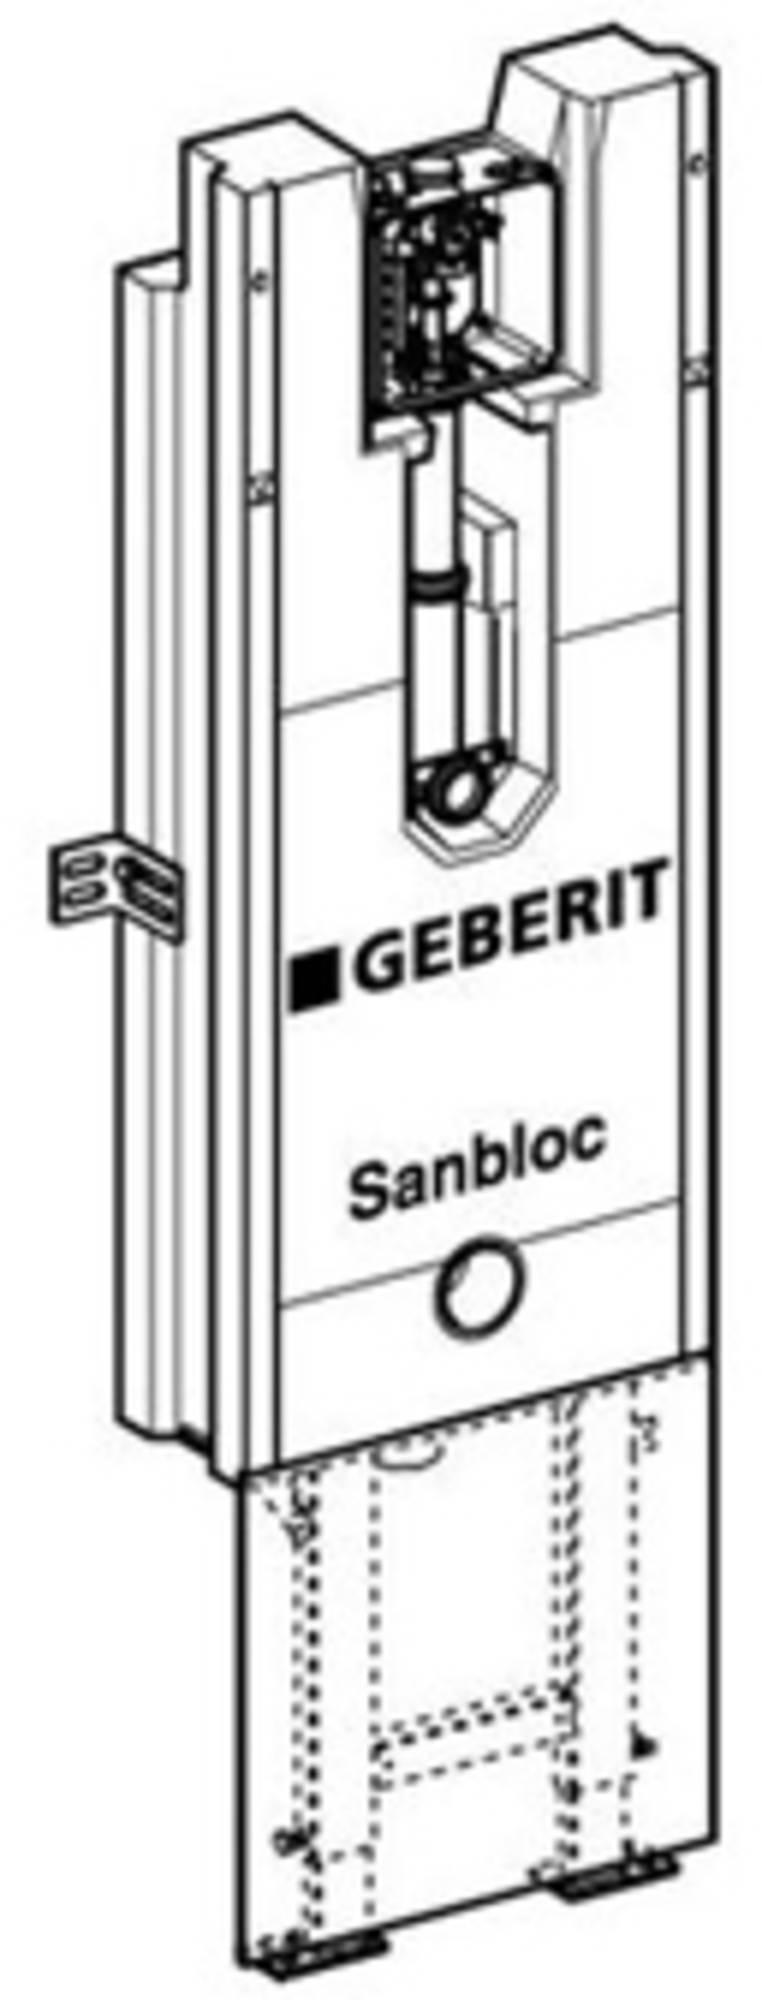 Geberit Sanbloc urinoir element h122 hoh aan-afvoer 345-440